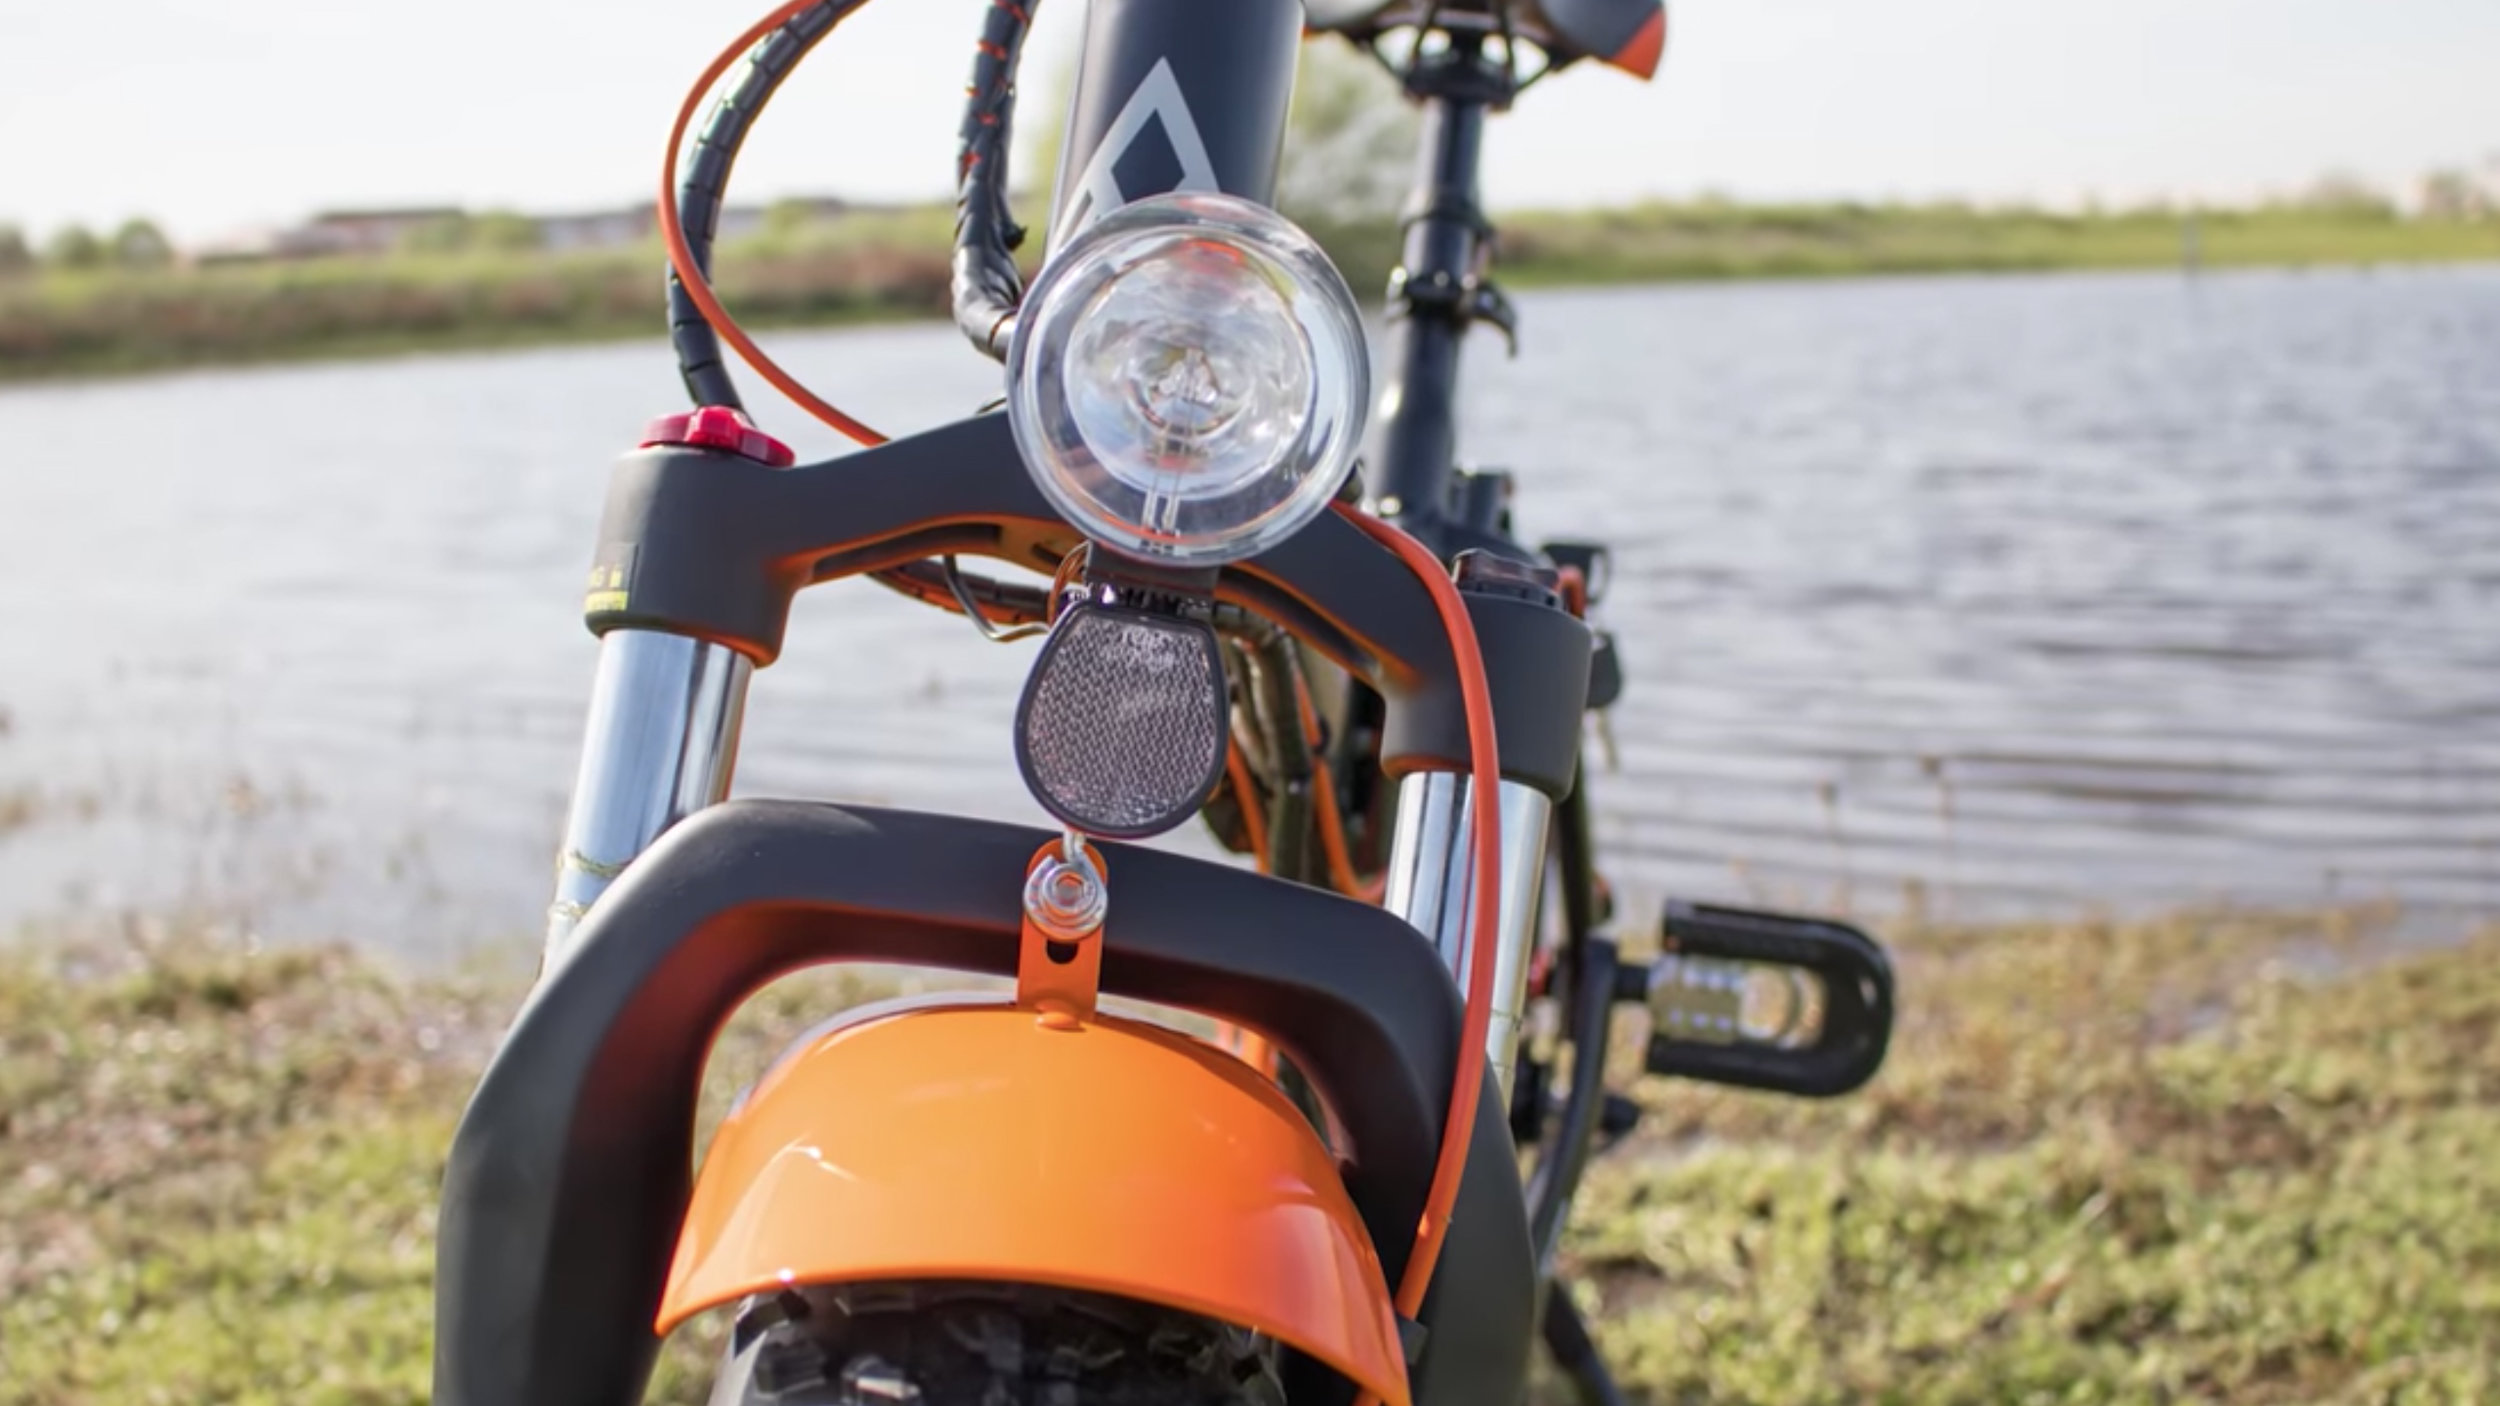 electrified-reviews-addmotor-motan-m150p7-electric-bike-review-headlight.jpg